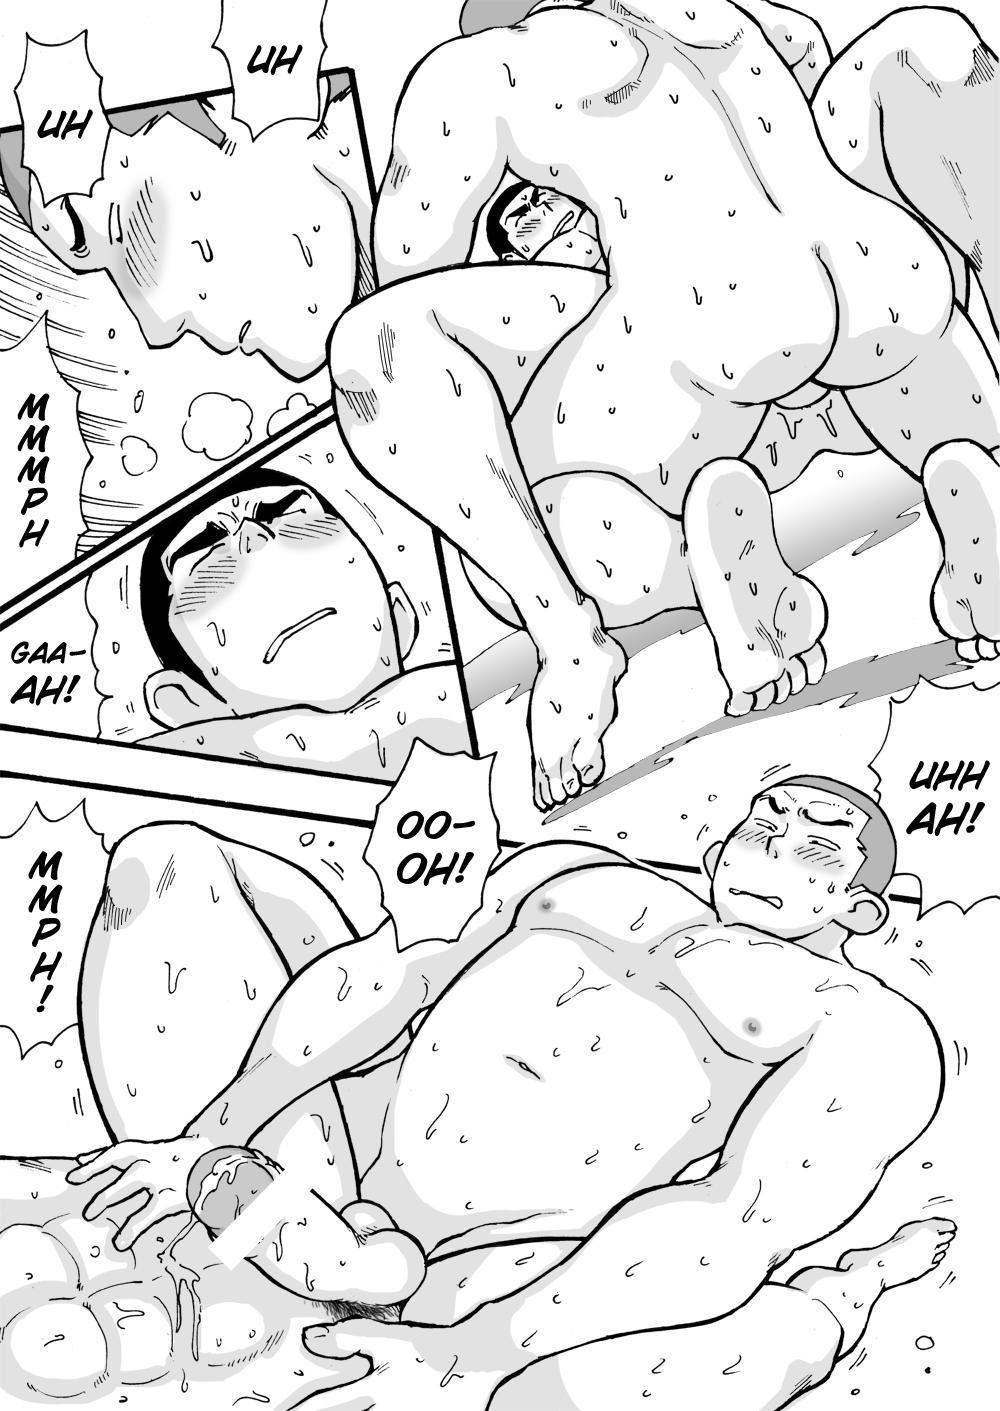 [Akahachi] Motemote Yakyuubu Otoko [Kouhen] | Popular Baseball Club Boys (Part Two) [English] [Papatez] 38